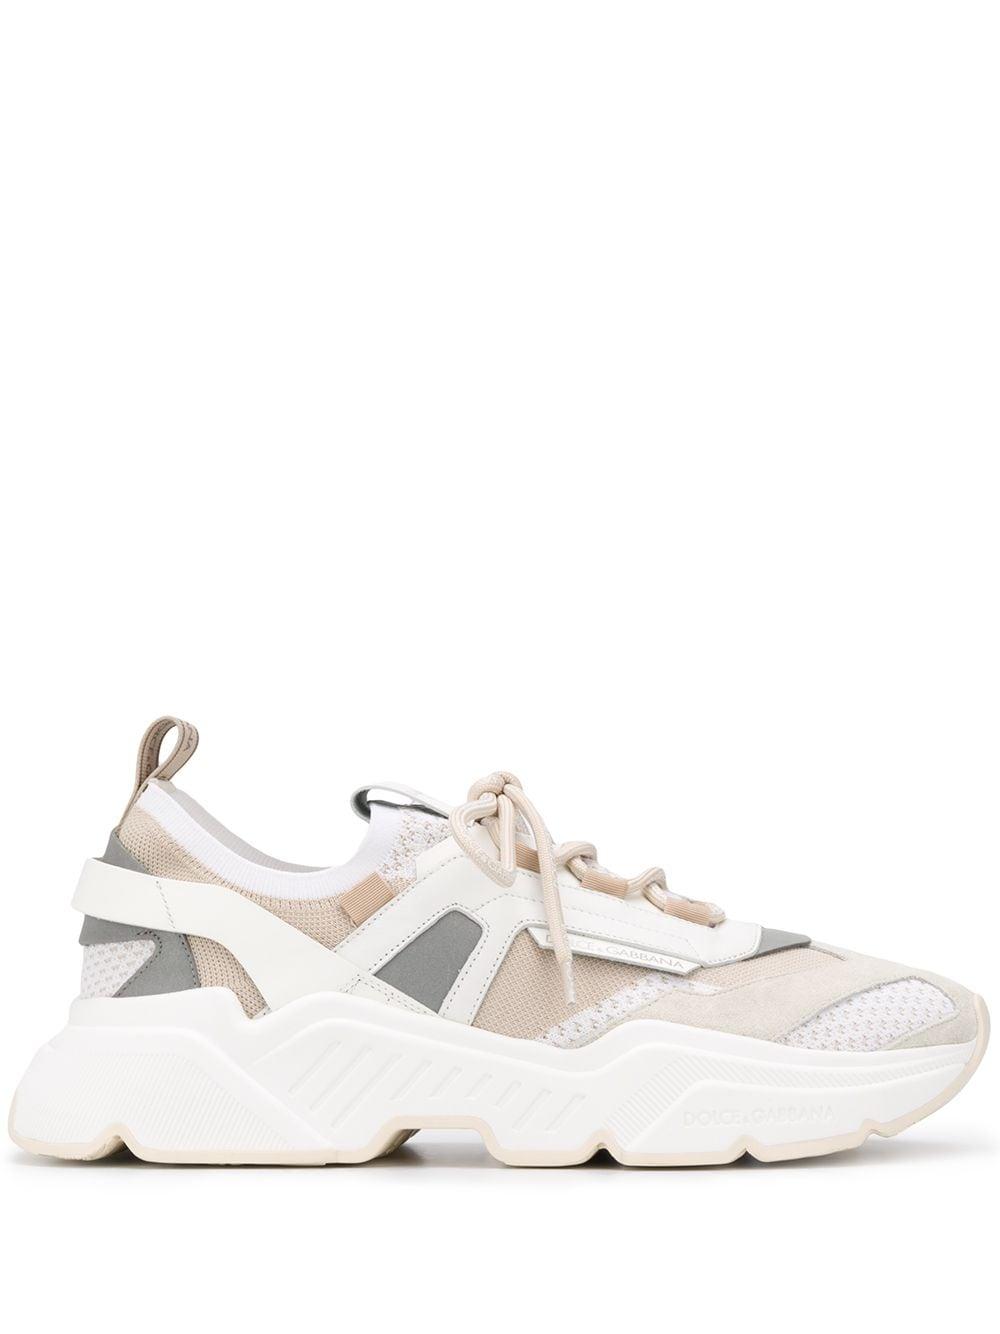 sneakers Daymaster bianco / beige in rete, pelle e gomma DOLCE & GABBANA | Scarpa | CS1766-AX03487769